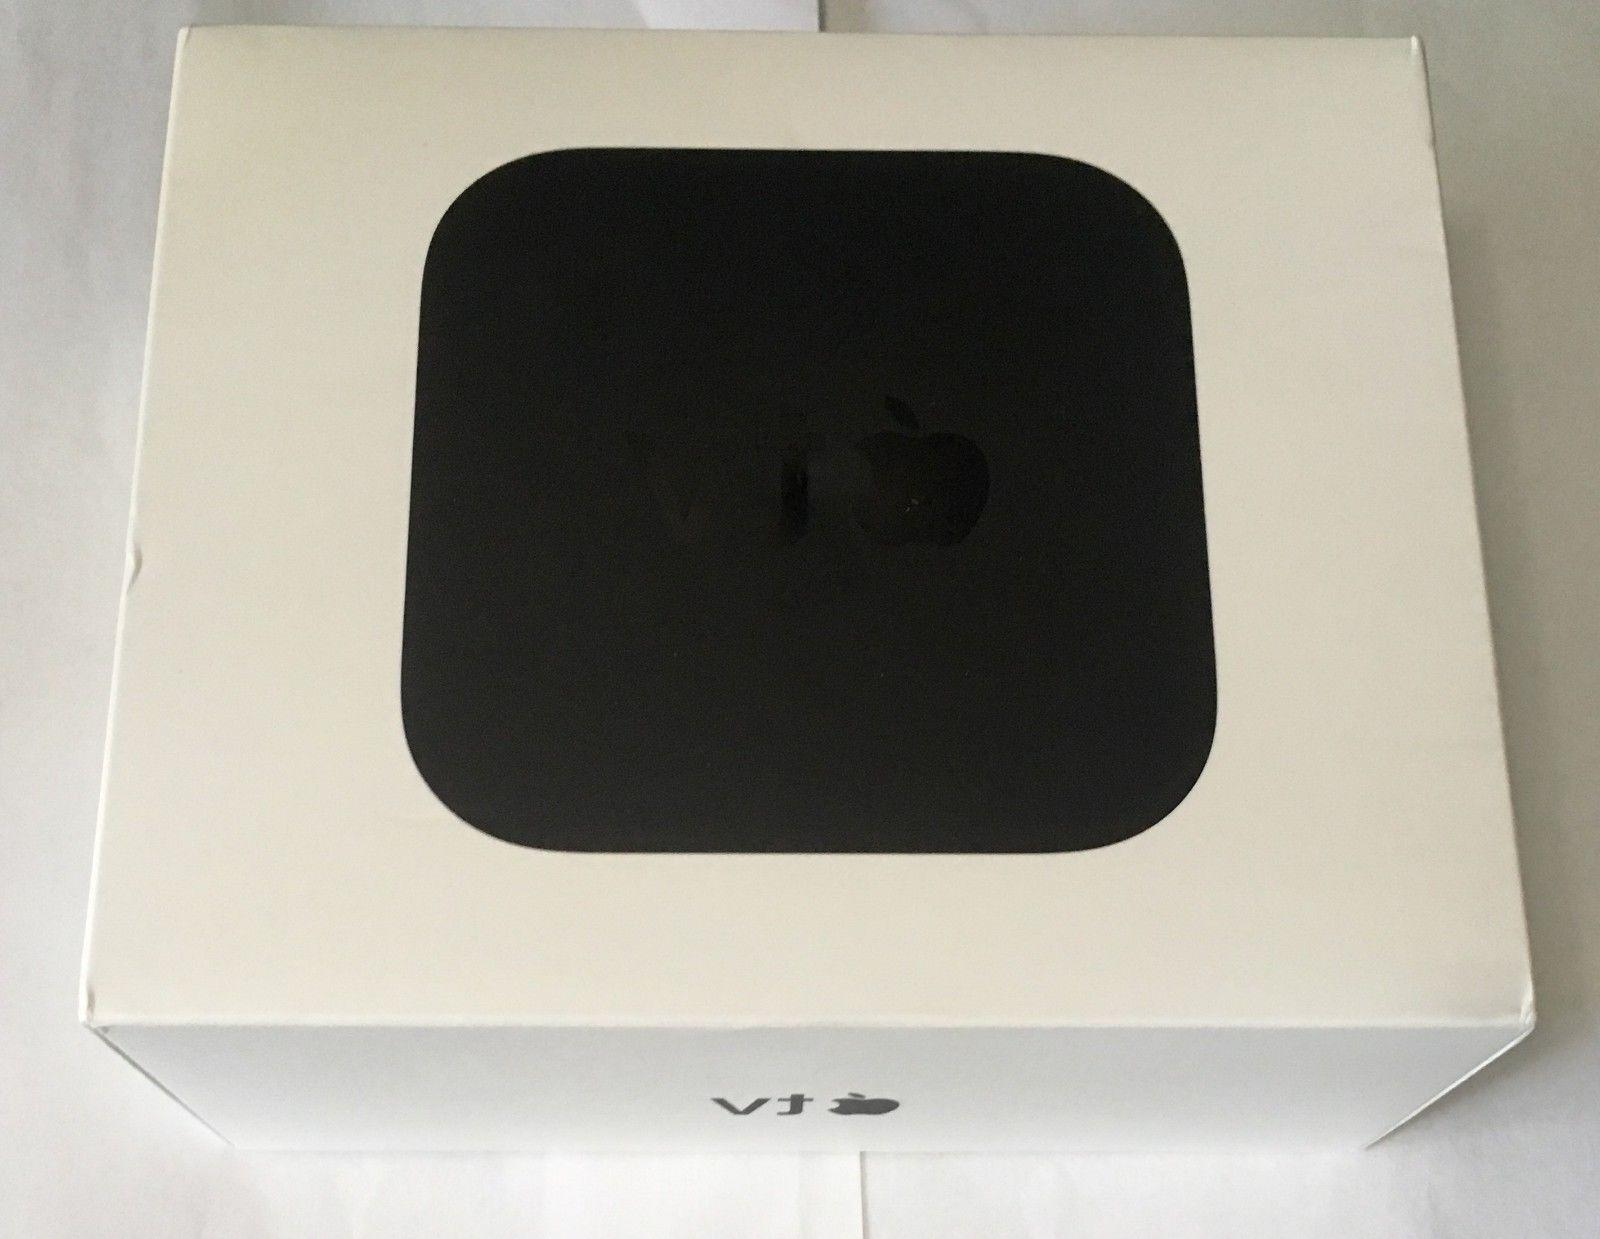 Apple MR912LL/A 1080p Streamer